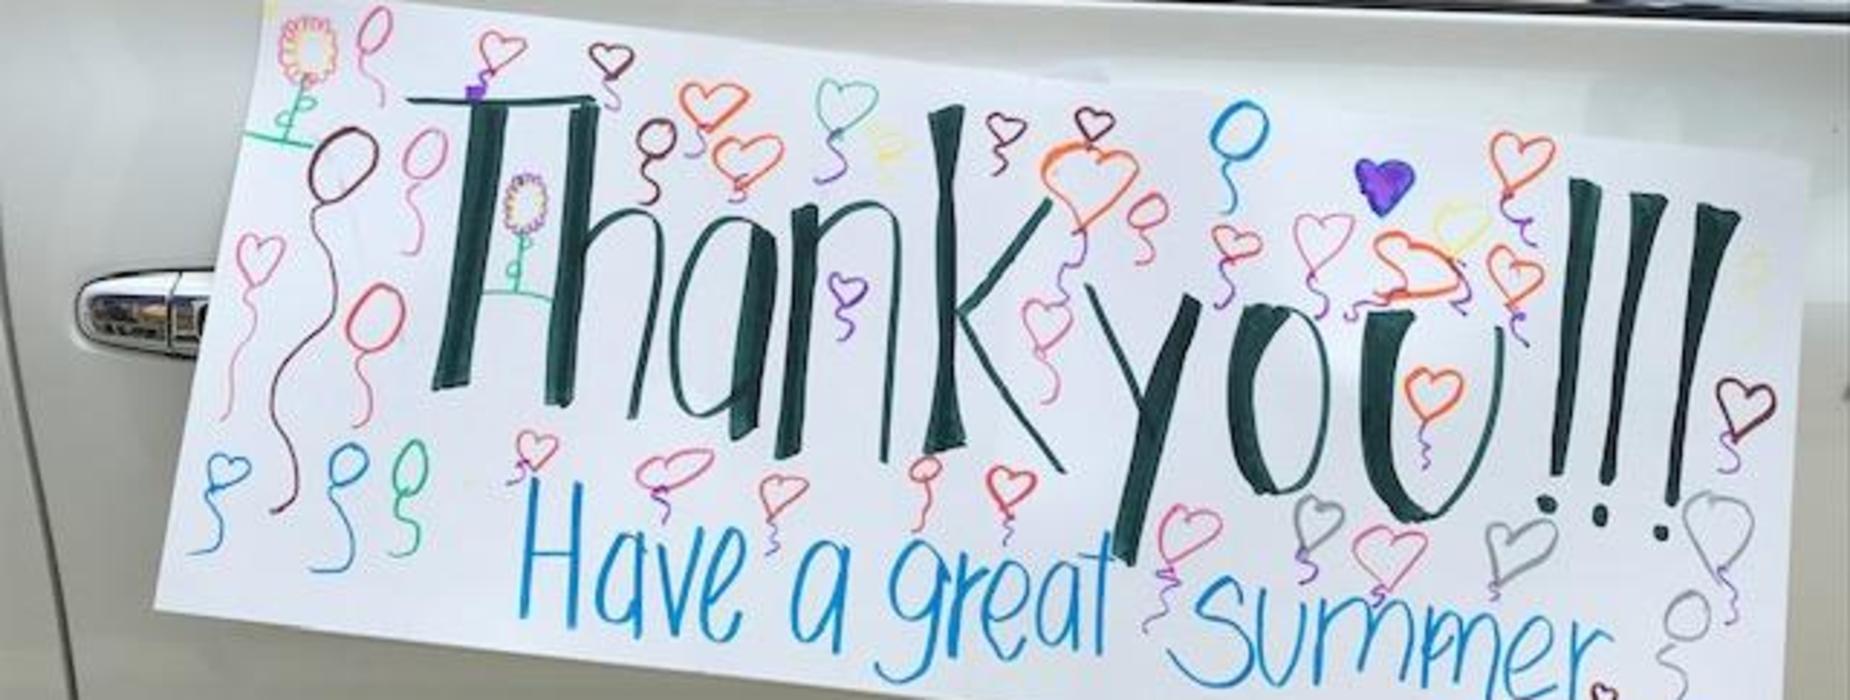 Marguerita family thanks staff during Drive-Thru event